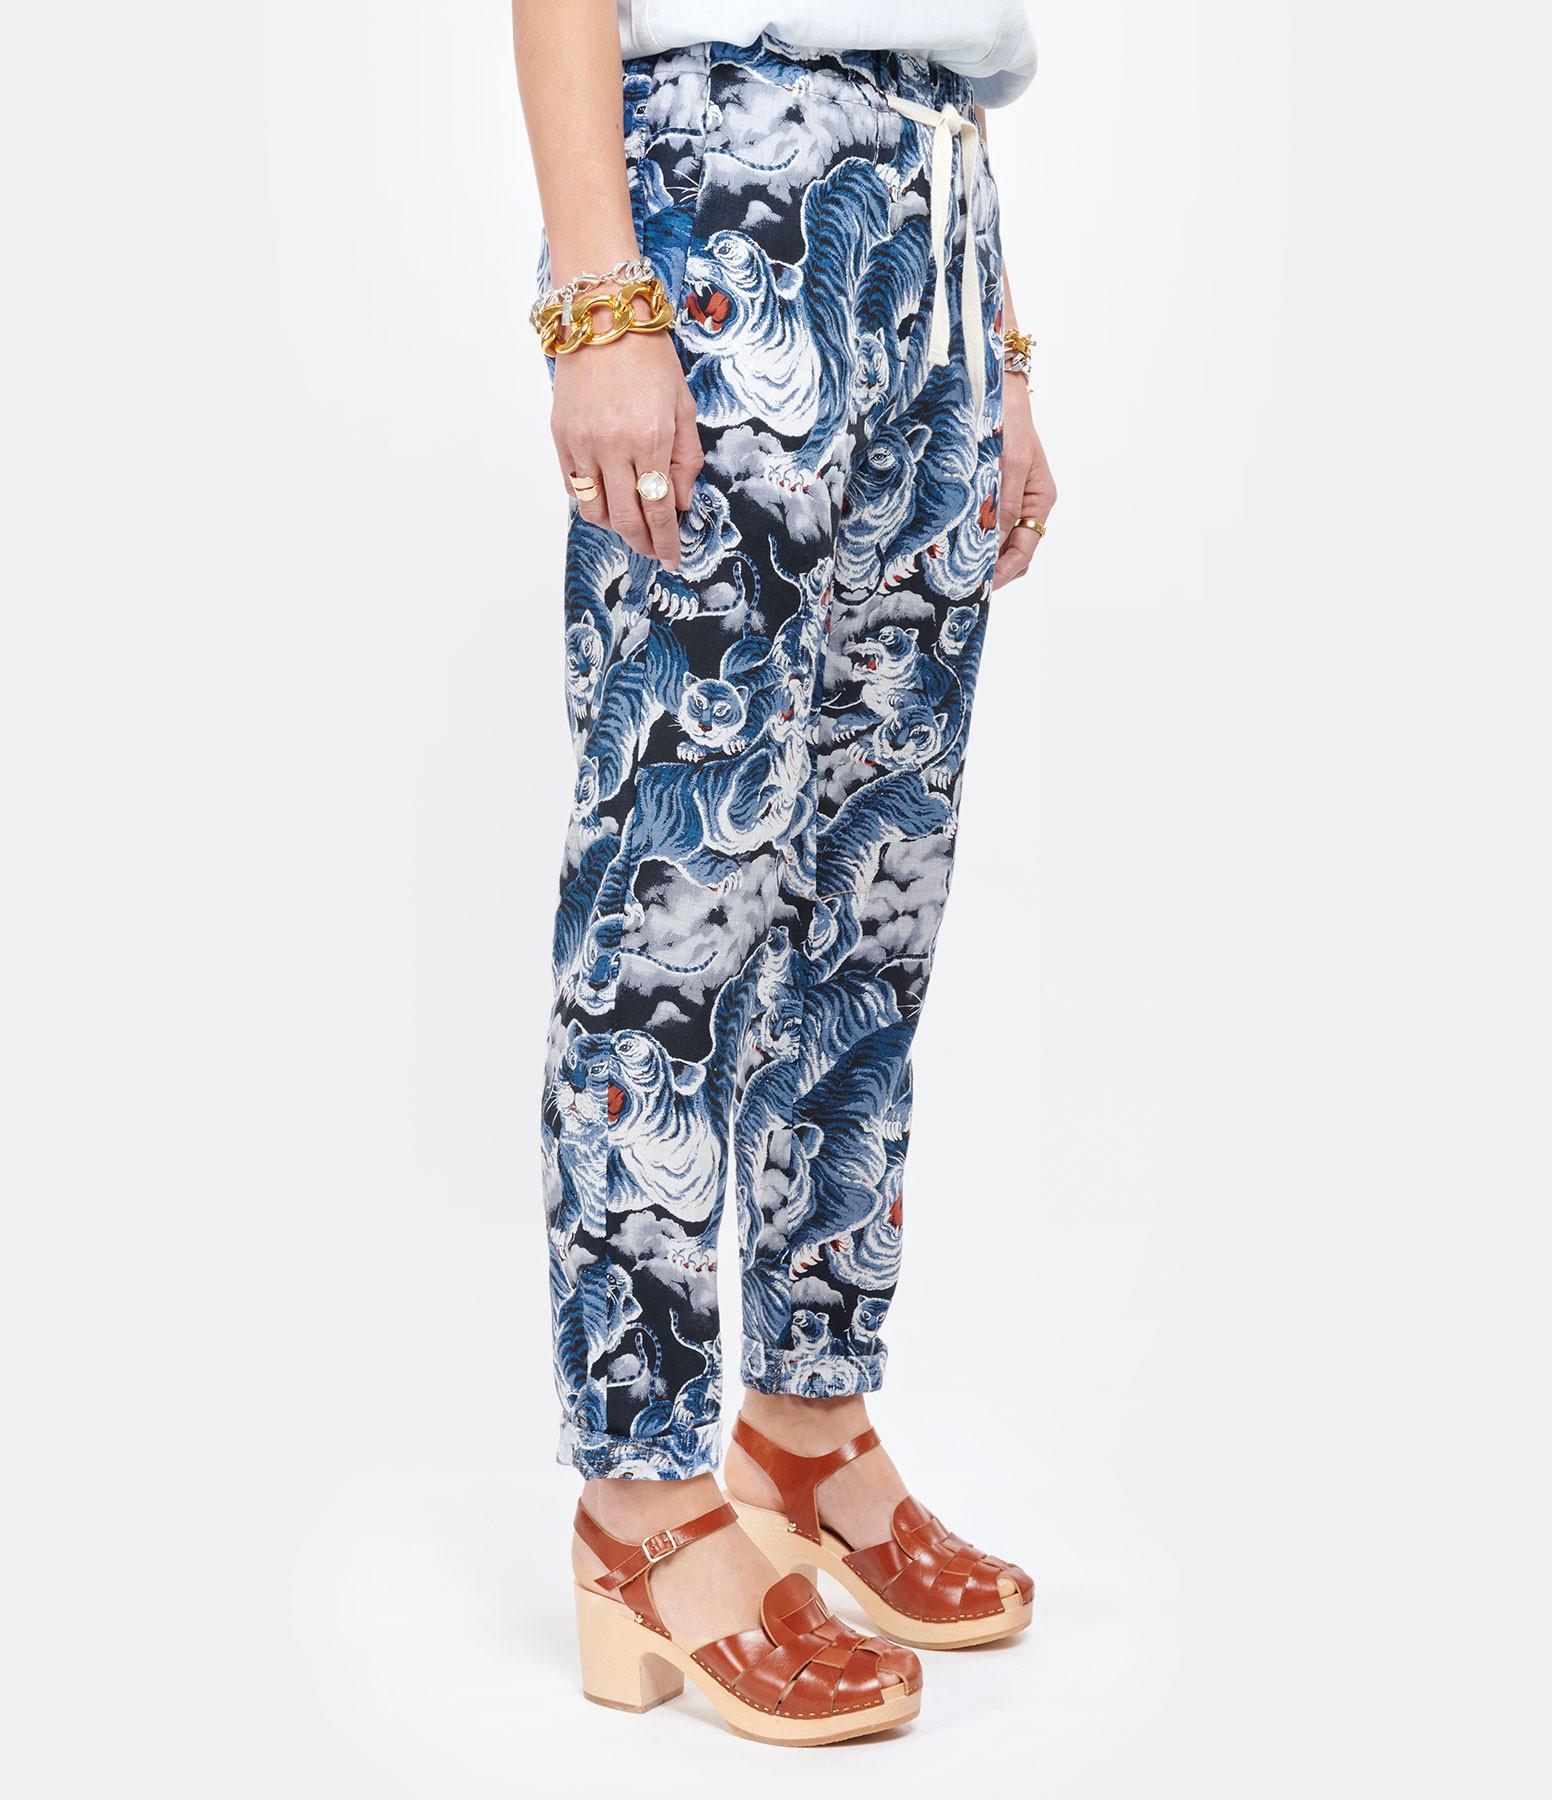 OVERLOVER - Pantalon Yucca Lin Tiger Blue Imprimé